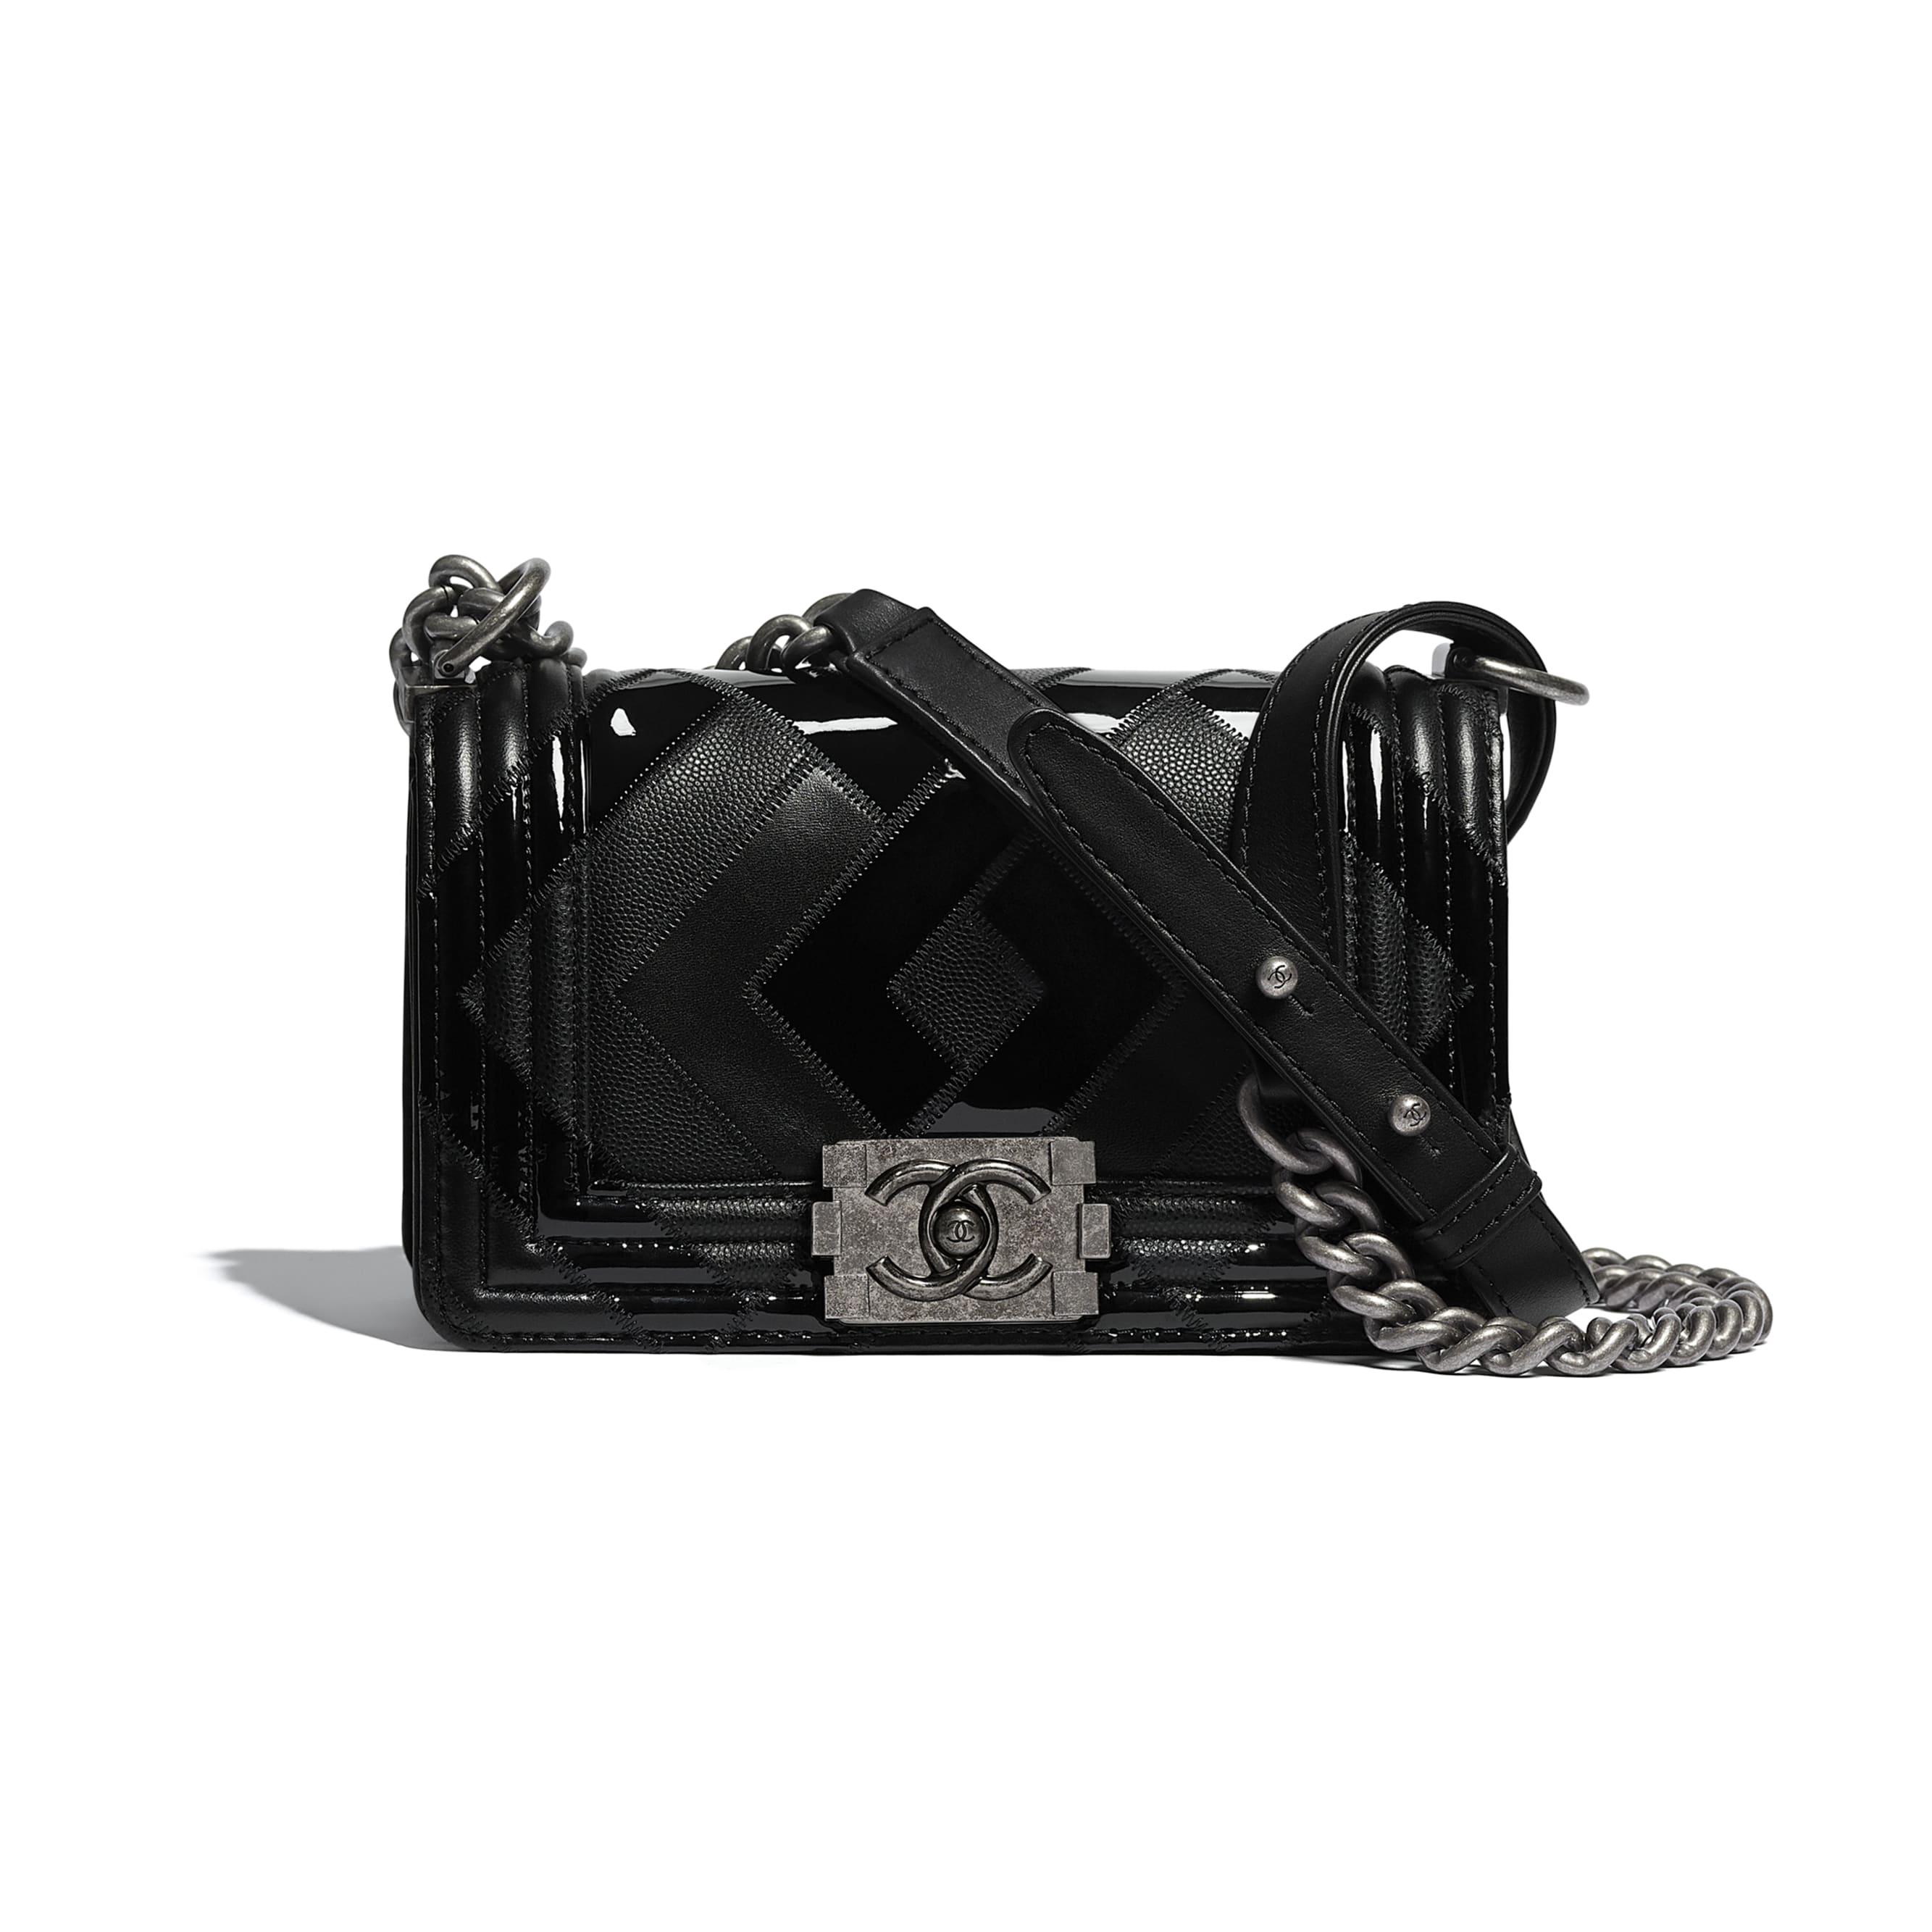 Small BOY CHANEL Handbag - Black - Calfskin, Patent Calfskin, Grained Calfskin & Ruthenium-Finish Metal - Default view - see standard sized version